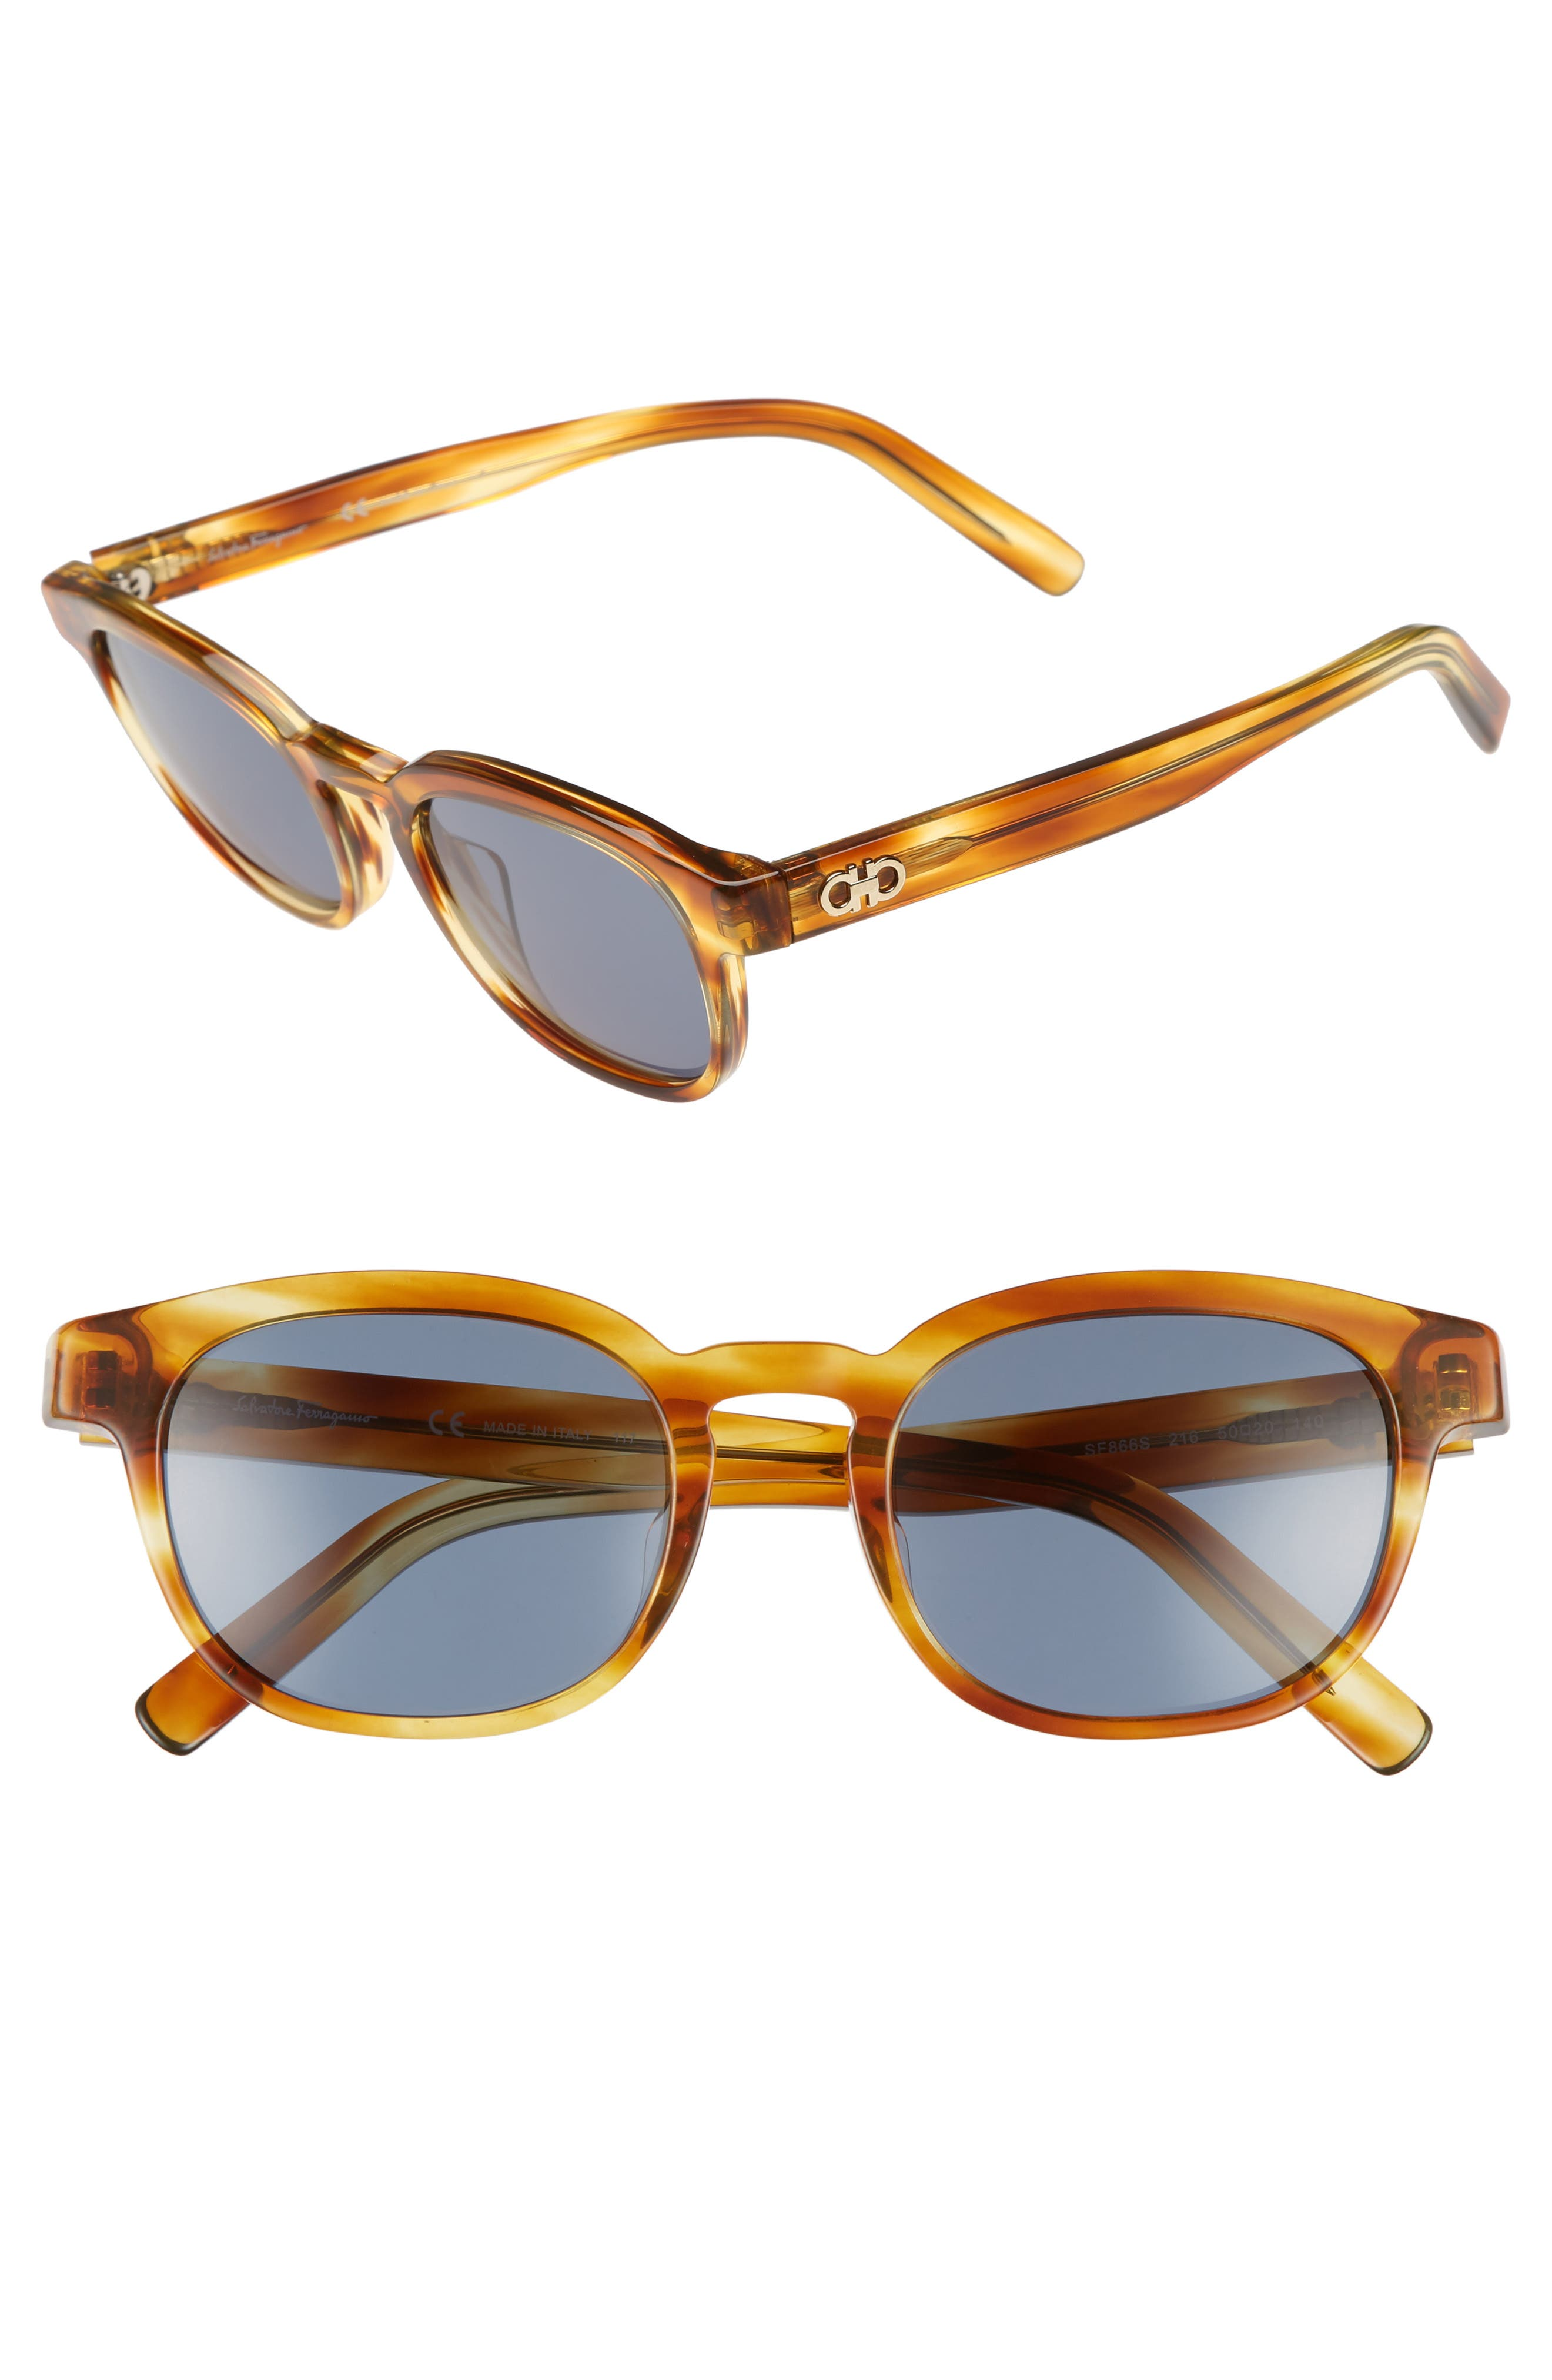 866S 50mm Sunglasses,                         Main,                         color, Striped Brown